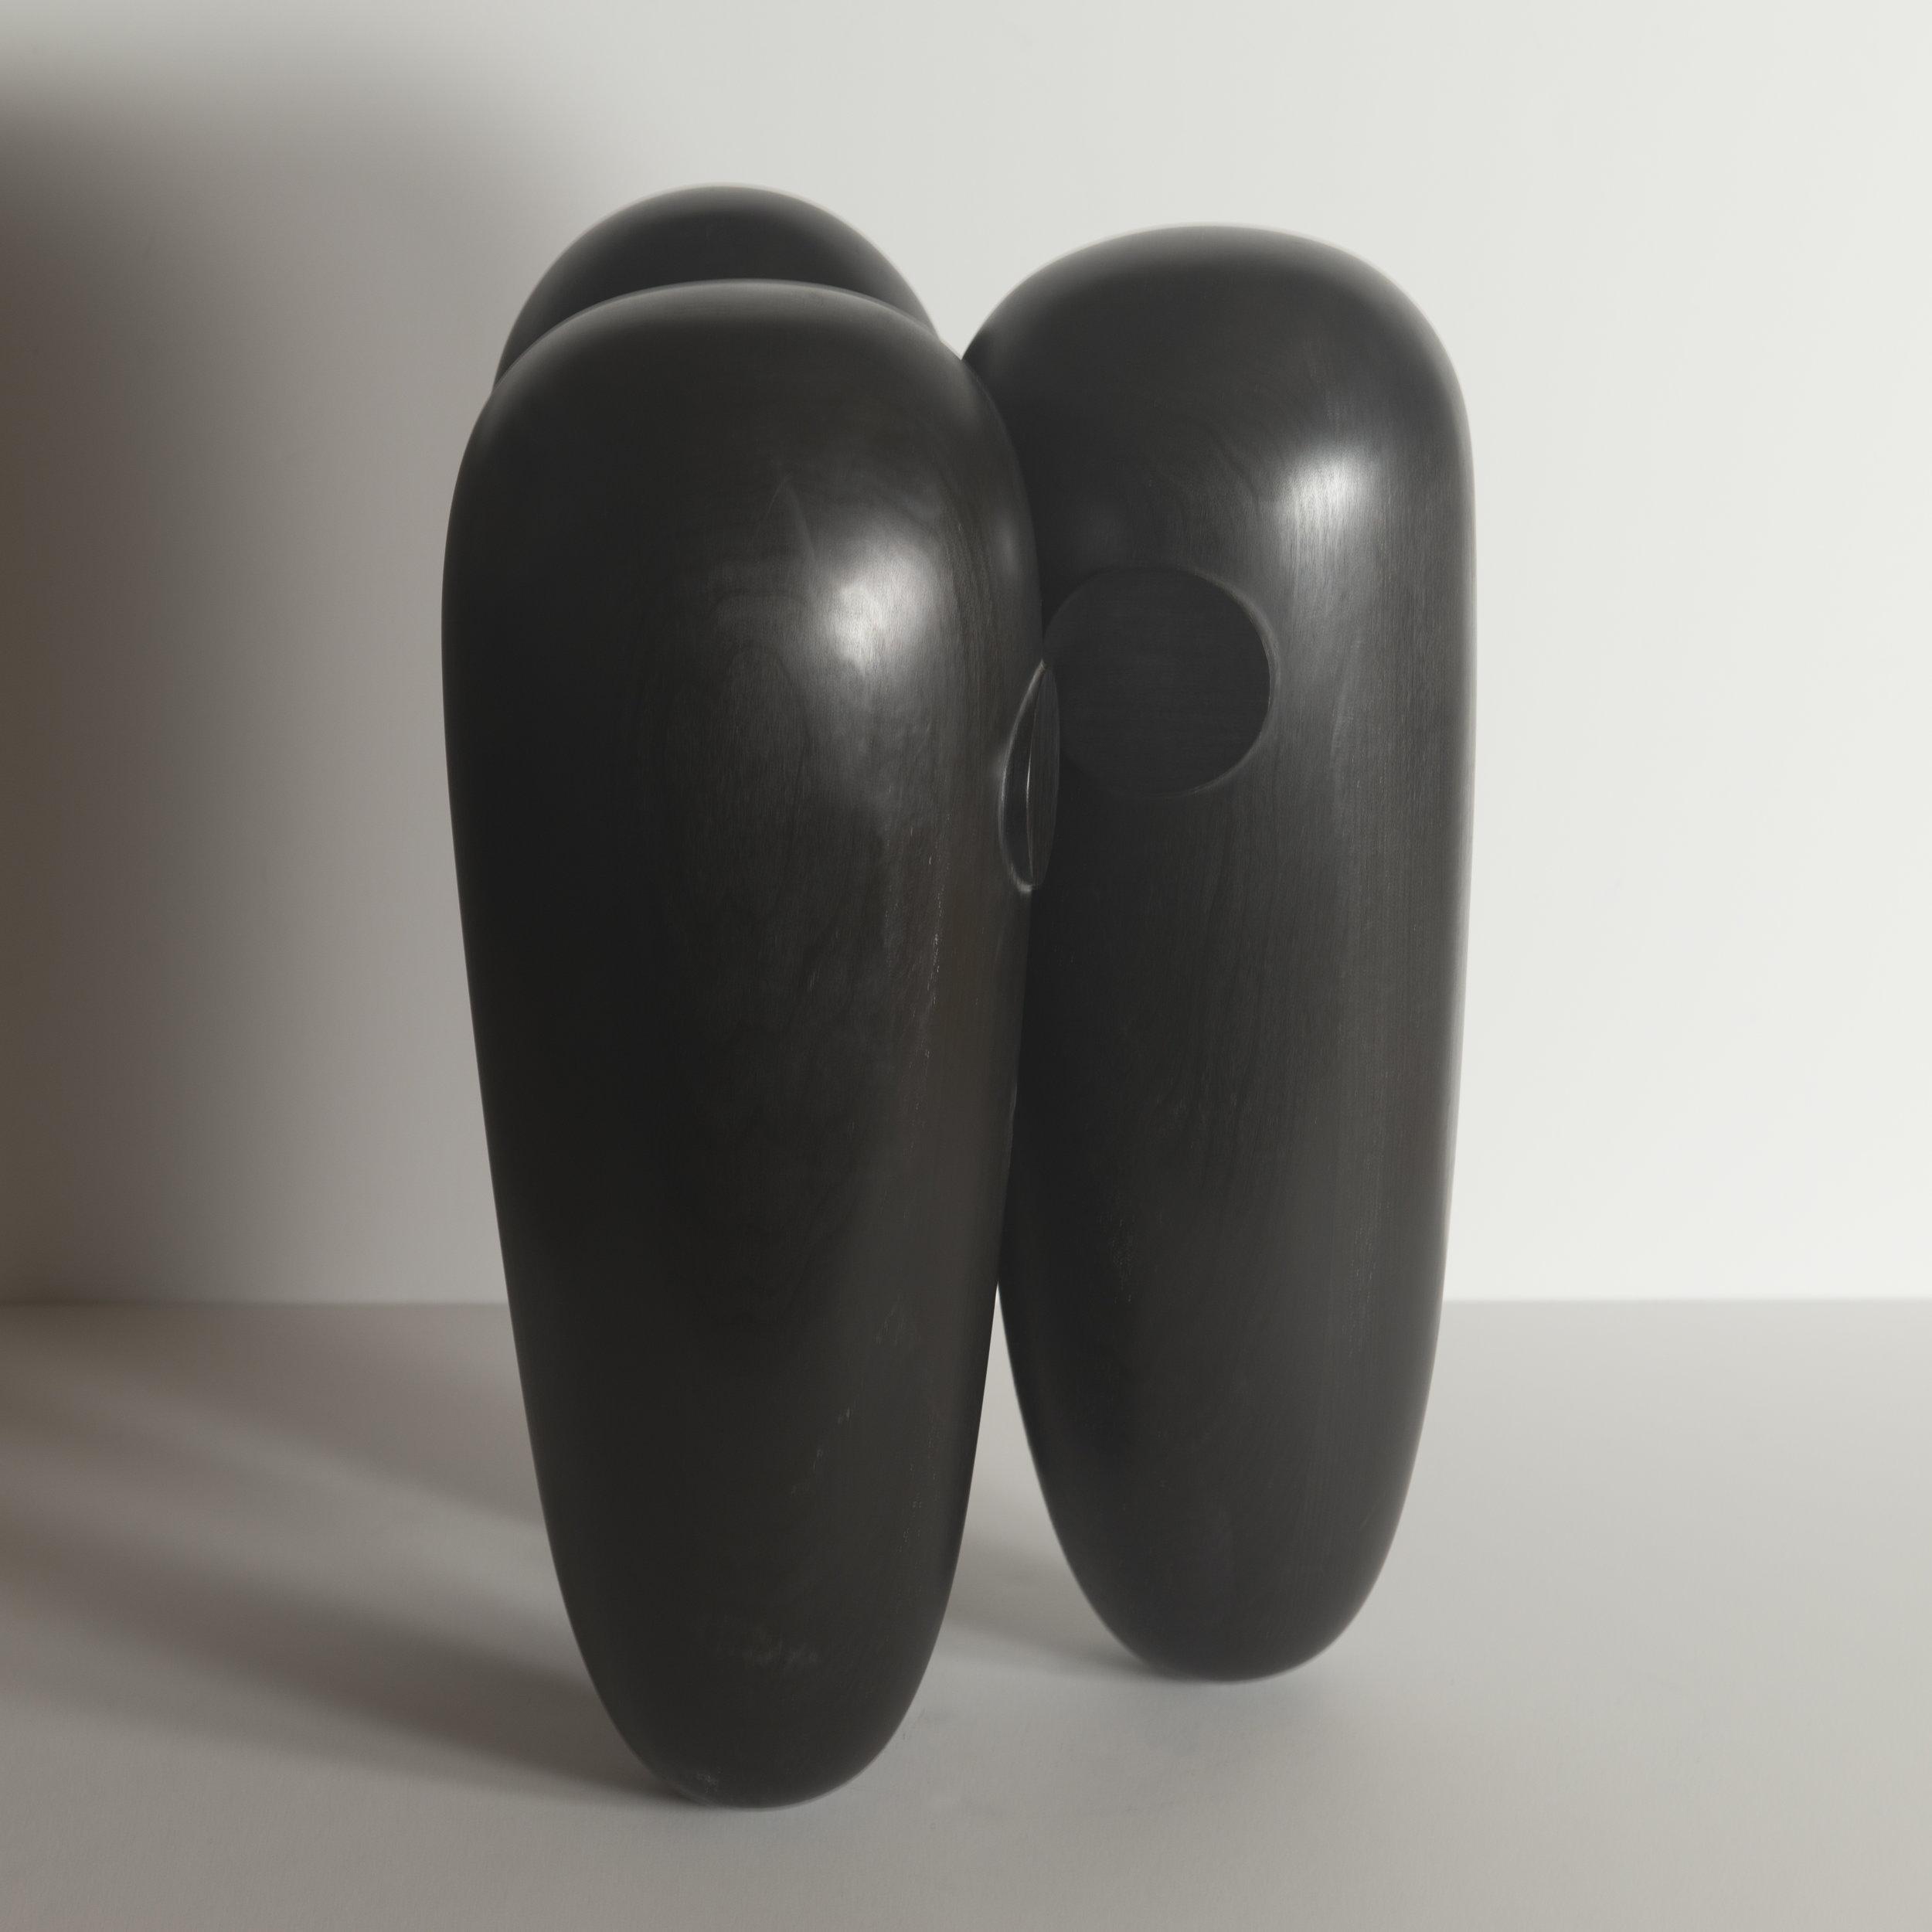 Monochrome Colletive : Gary Kret : Conspiracy : maple, black aniline dye paste, wax finish : 18.5 x 13.5 x 13 in. : $4,900.jpg